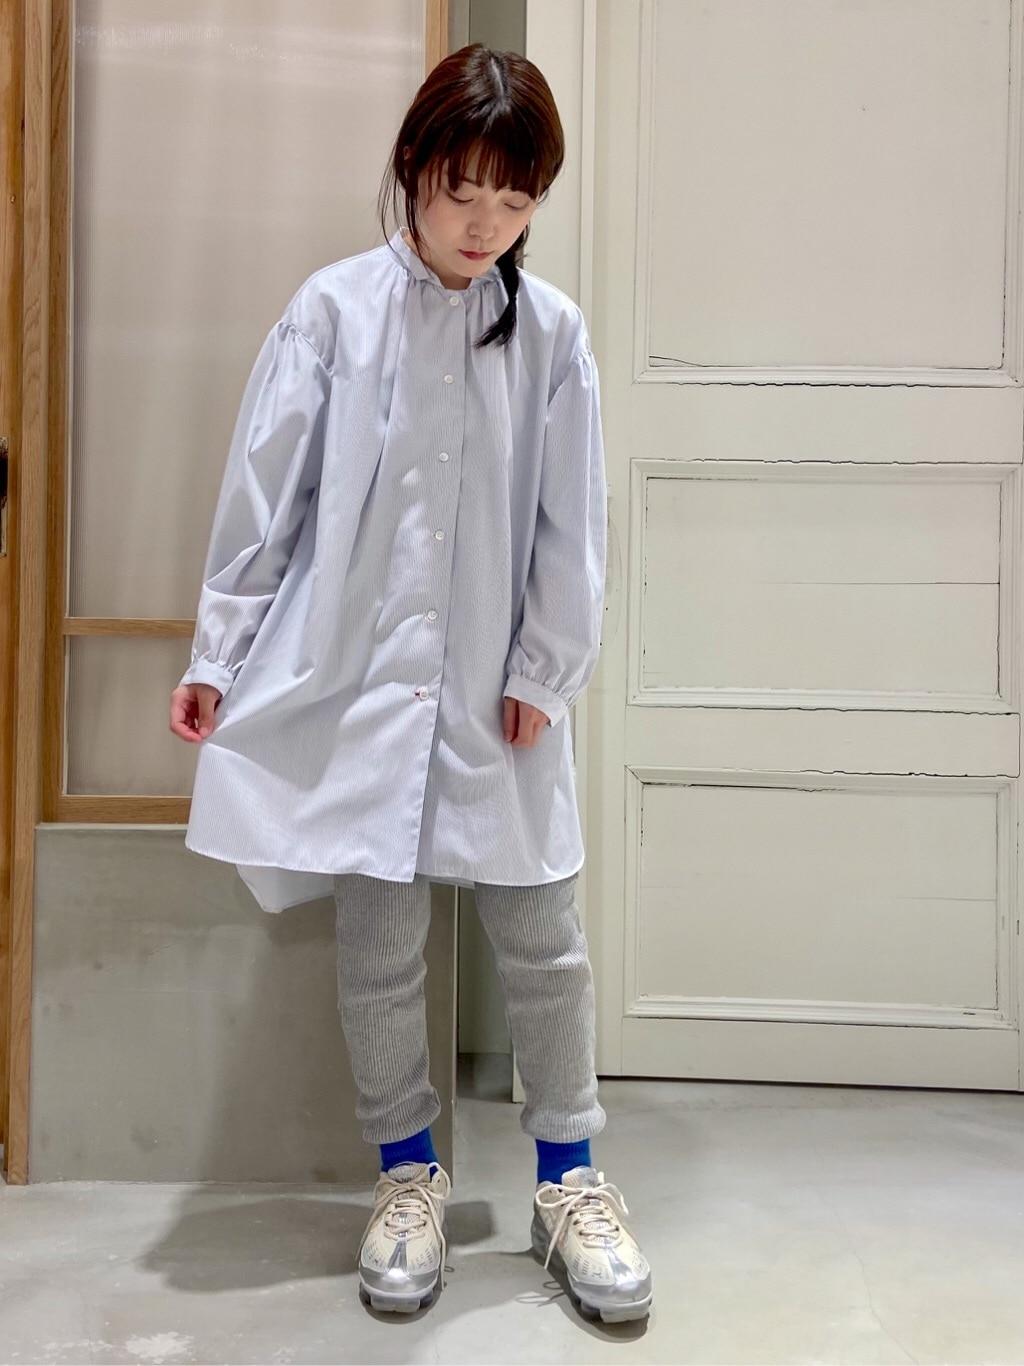 bulle de savon 渋谷スクランブルスクエア 身長:153cm 2020.12.18